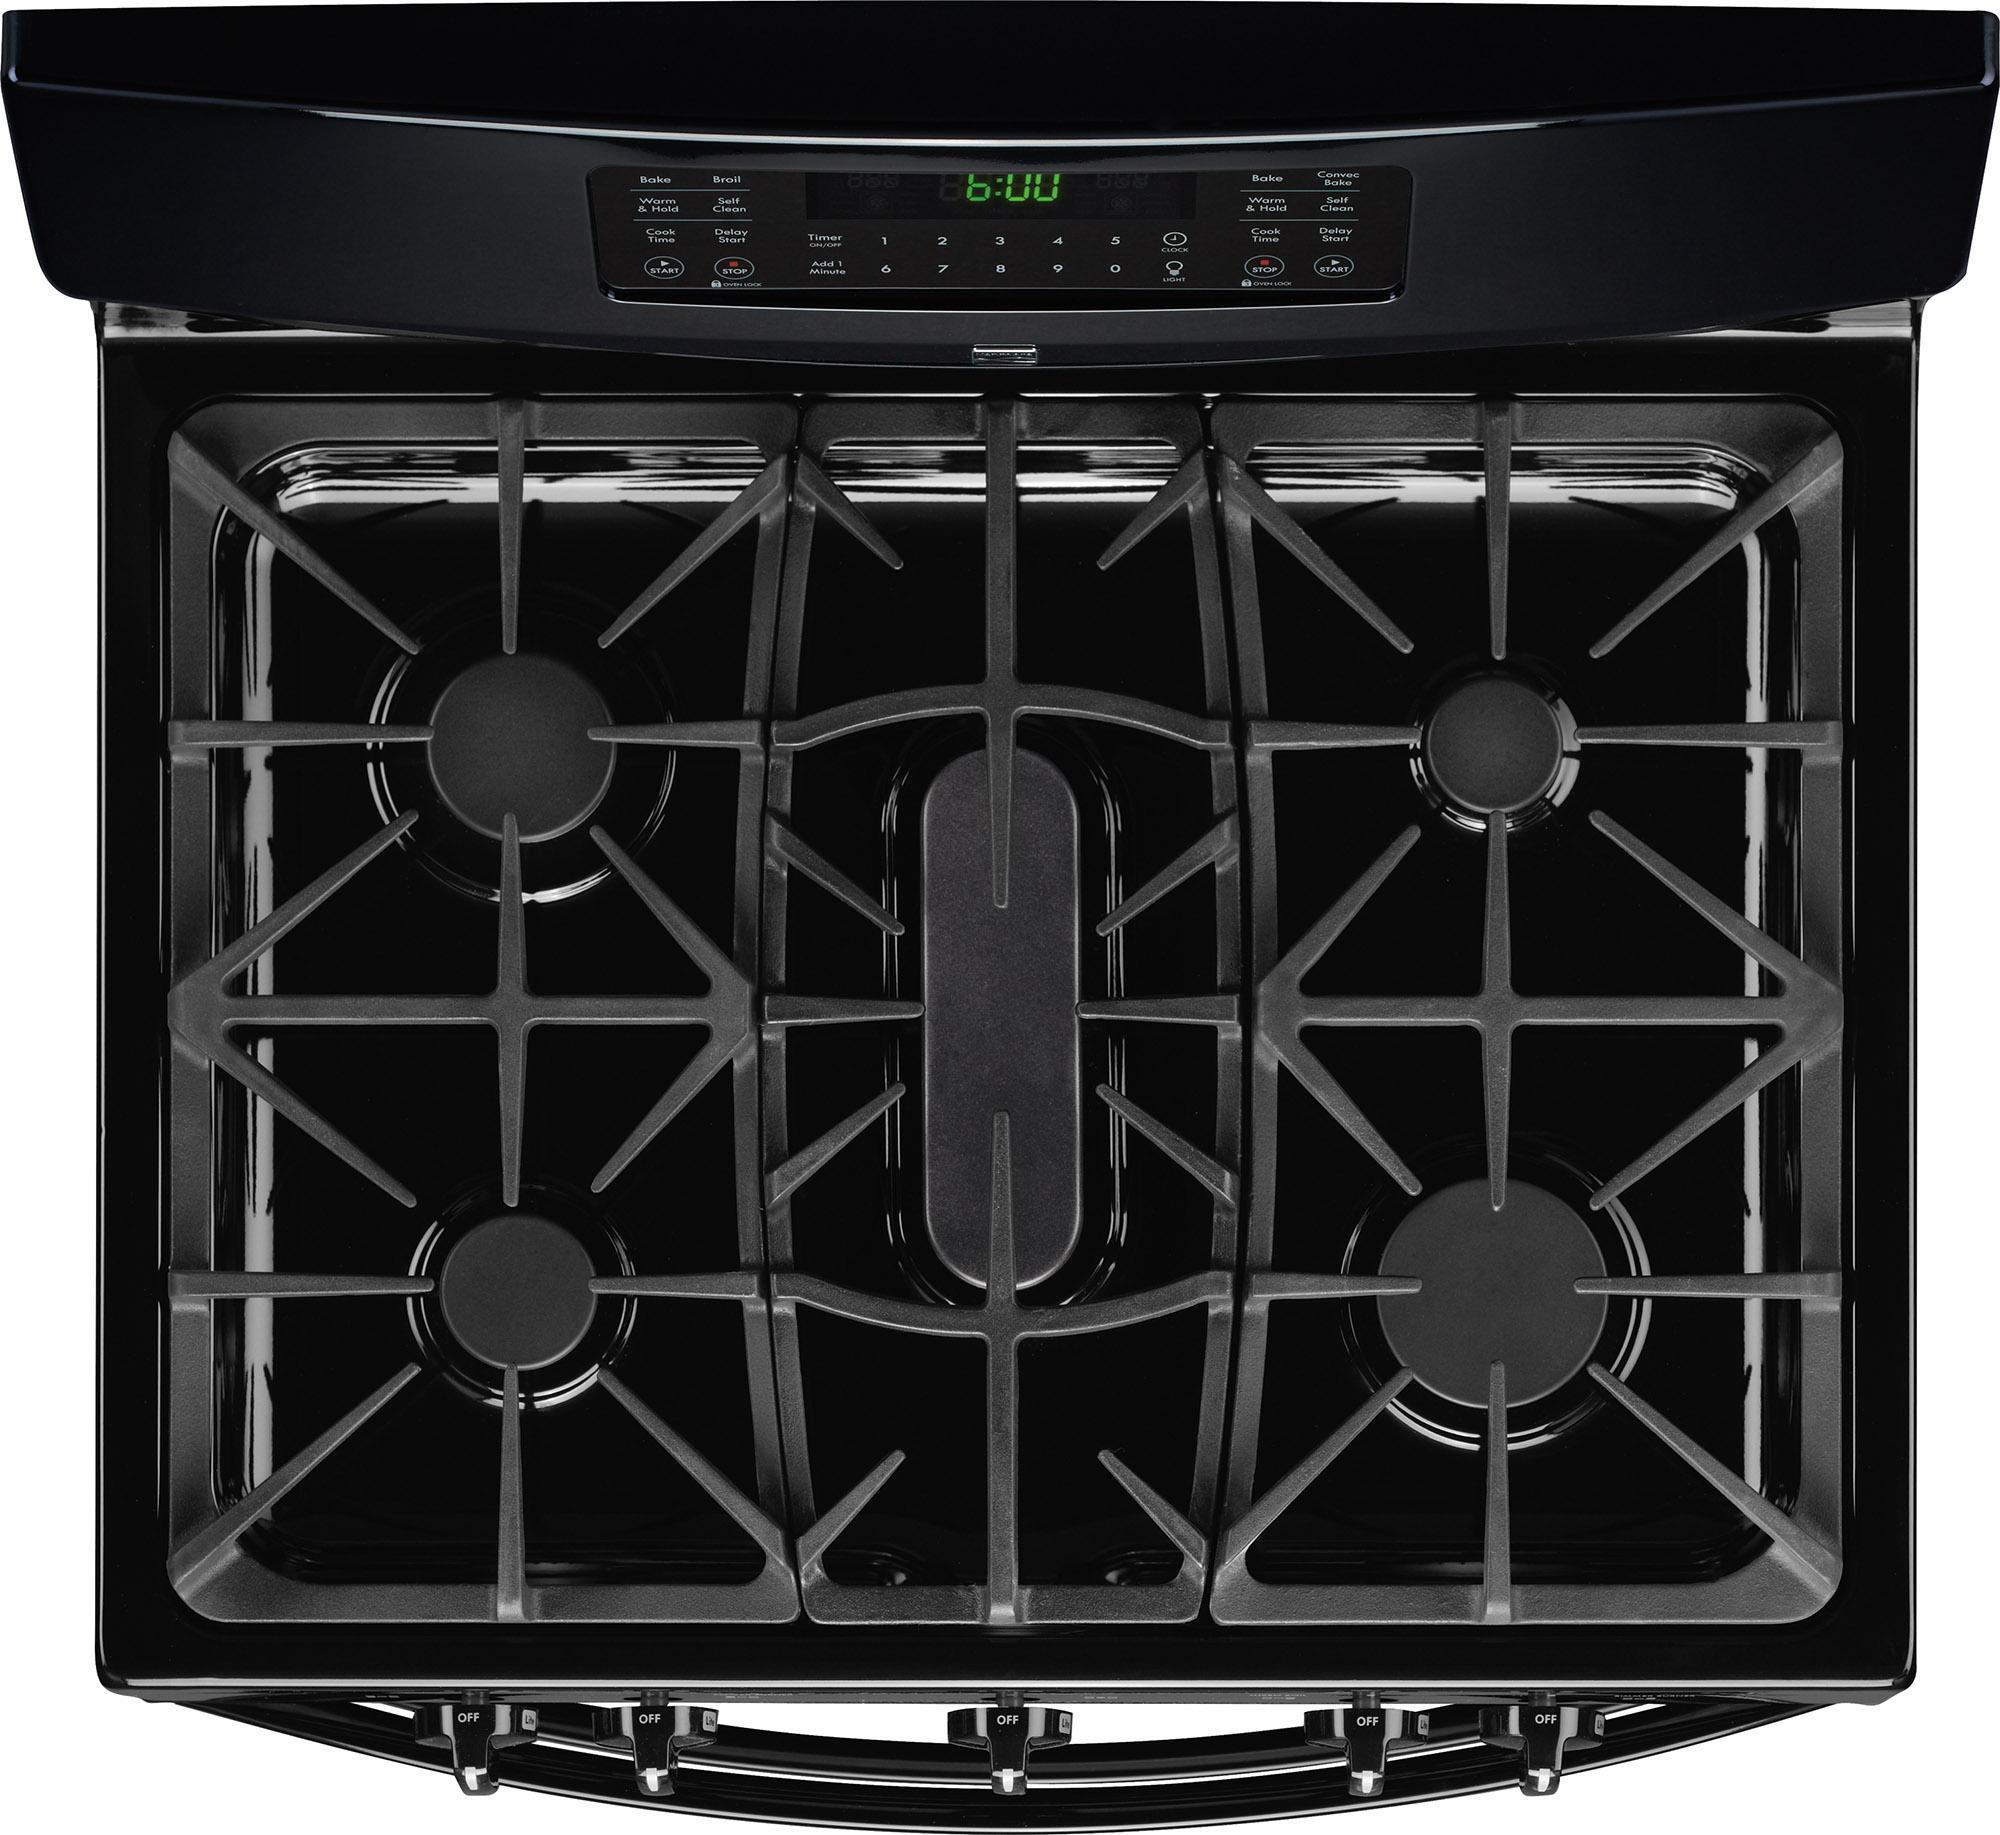 Kenmore 78049 5.9 cu. ft. Double-Oven Gas Range - Black